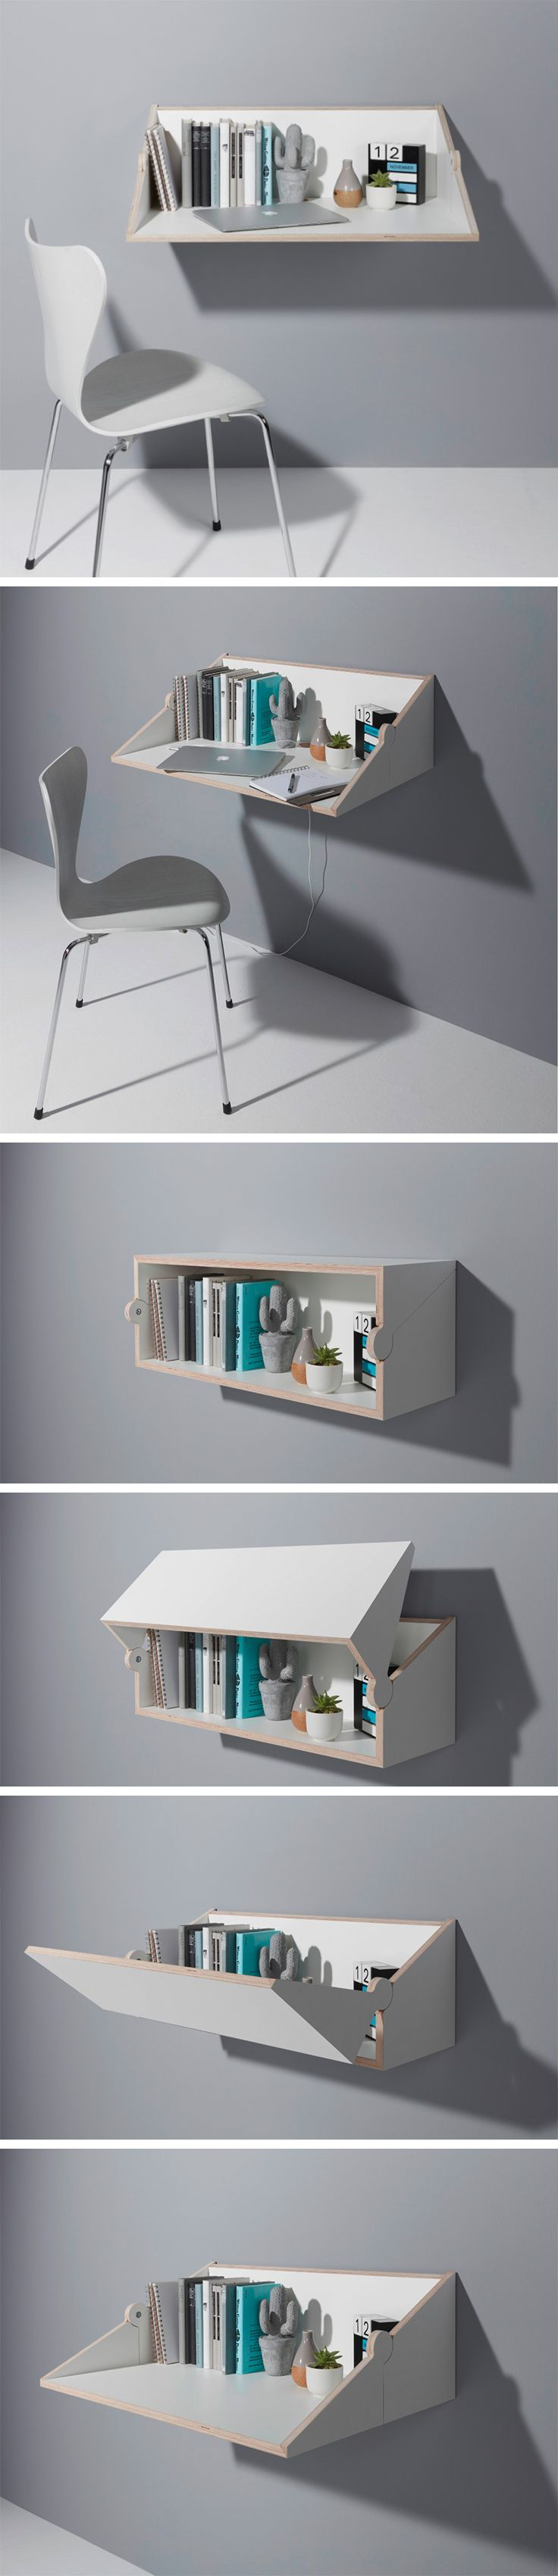 Best 25+ Multifunctional furniture ideas on Pinterest ...